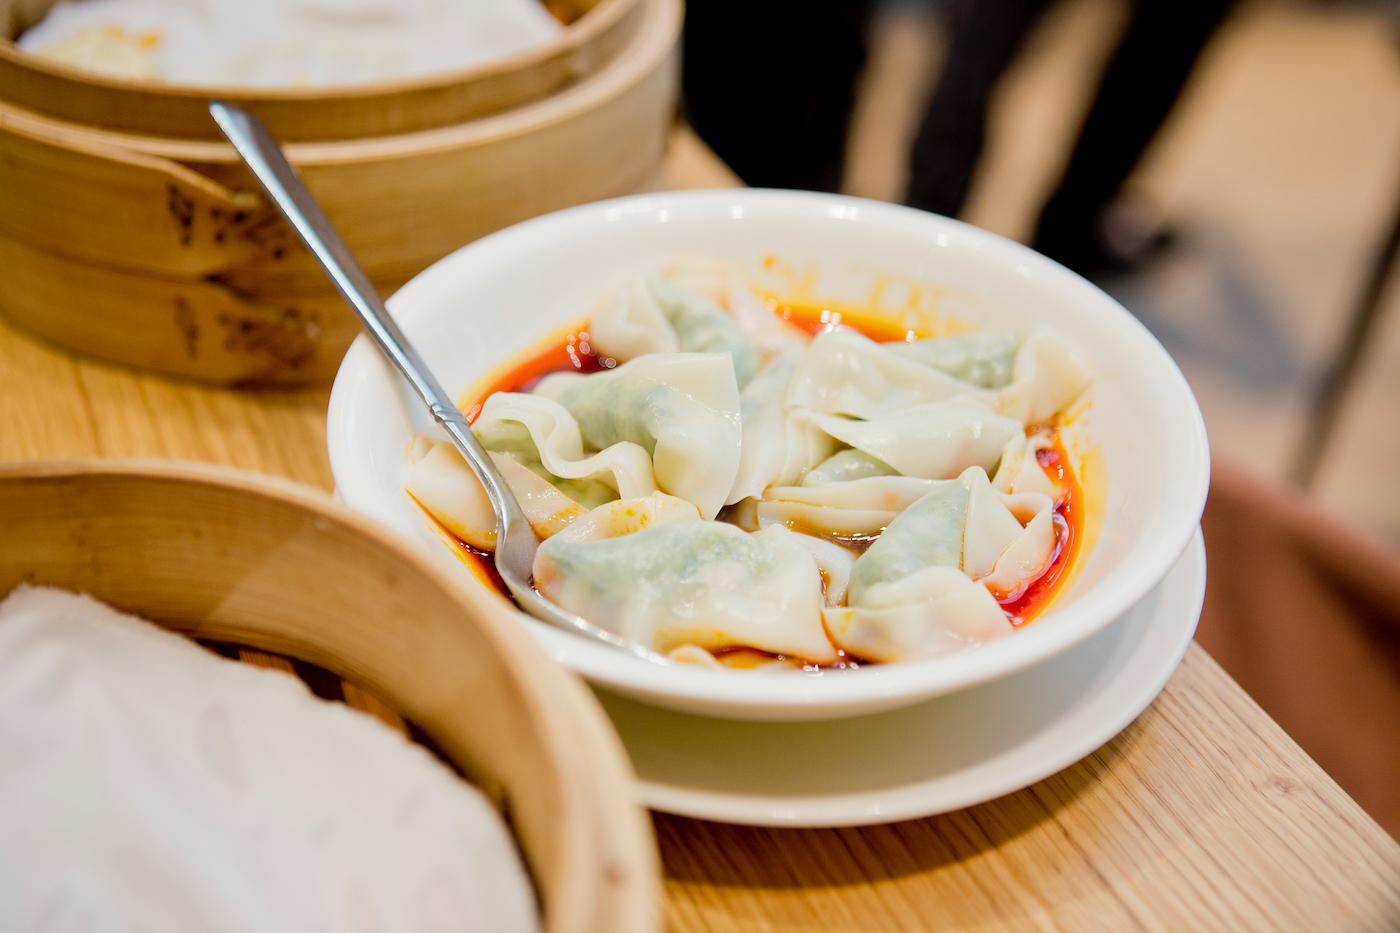 din tai fung dubai _ emirates mall _ eating dubai _ cheap restaurants dubai